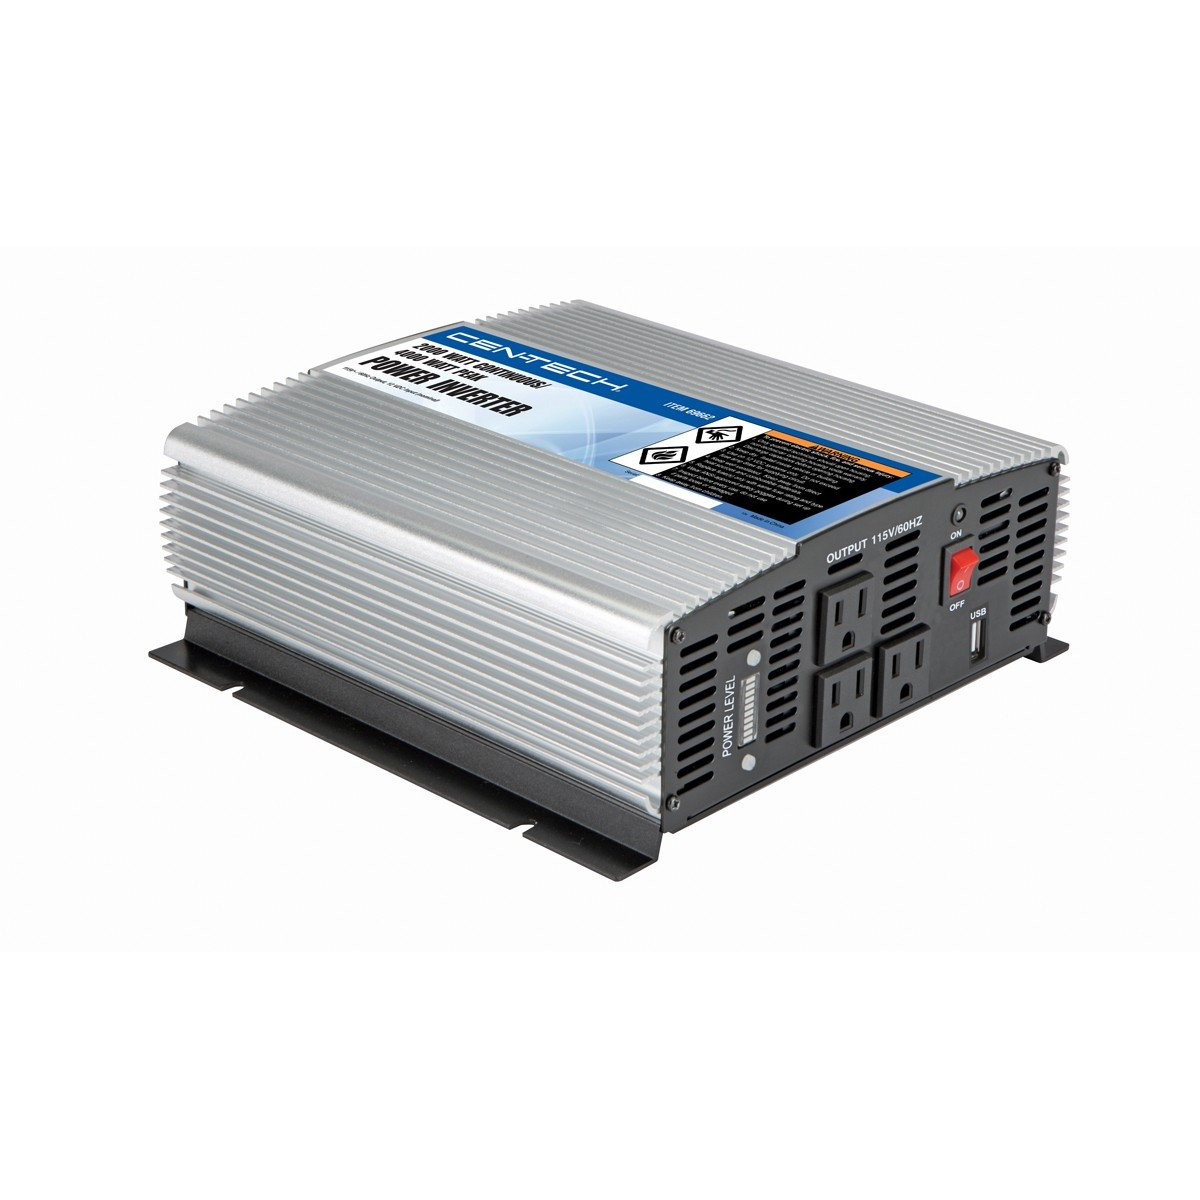 2000 Watt Continuous/4000 Watt Peak Power Inverter from TNM